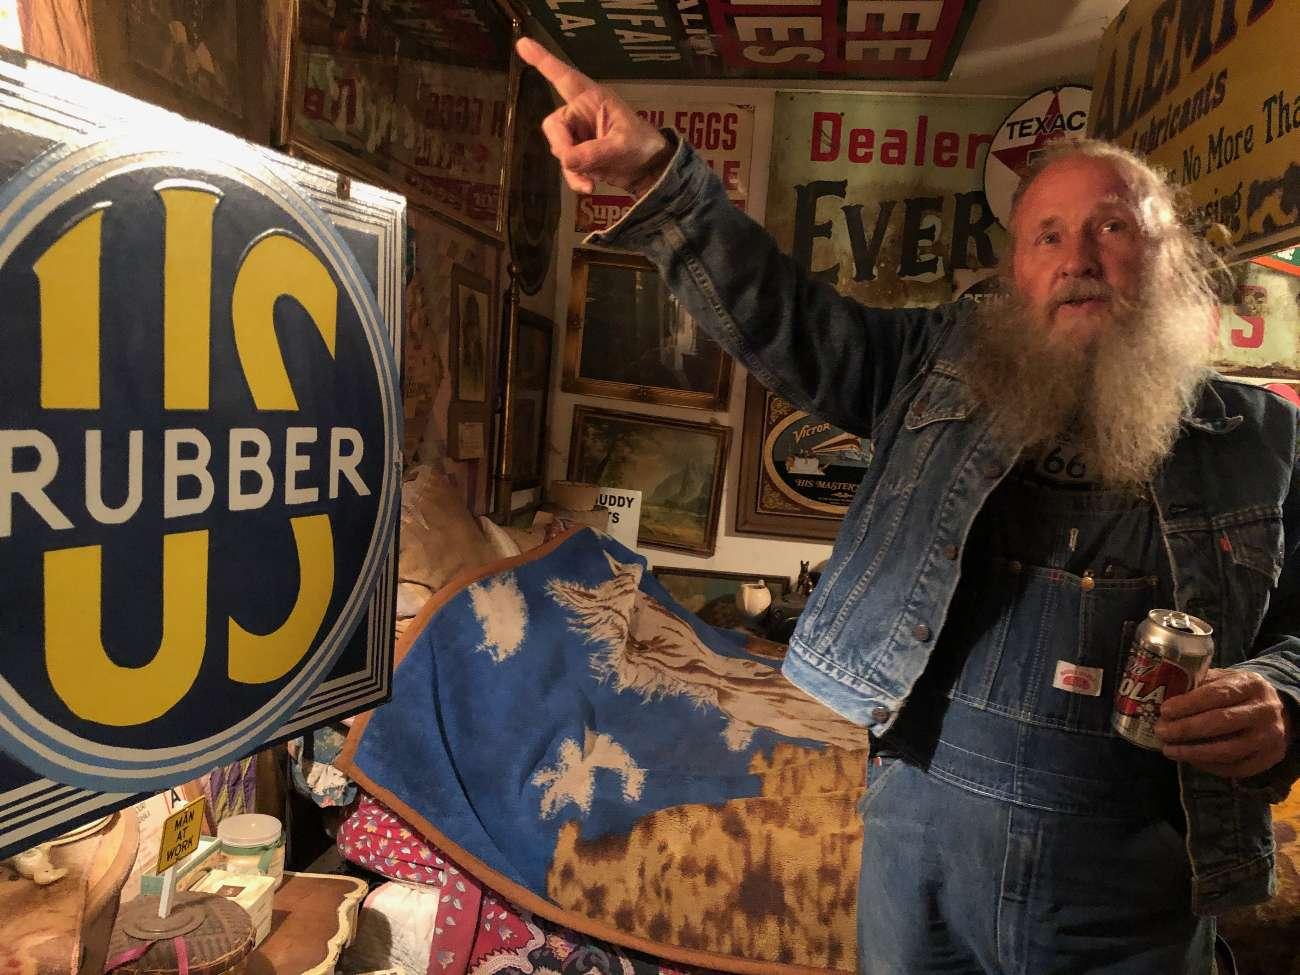 Route-66-Legende Harvey Russell in seinem Laden in Erick, OK